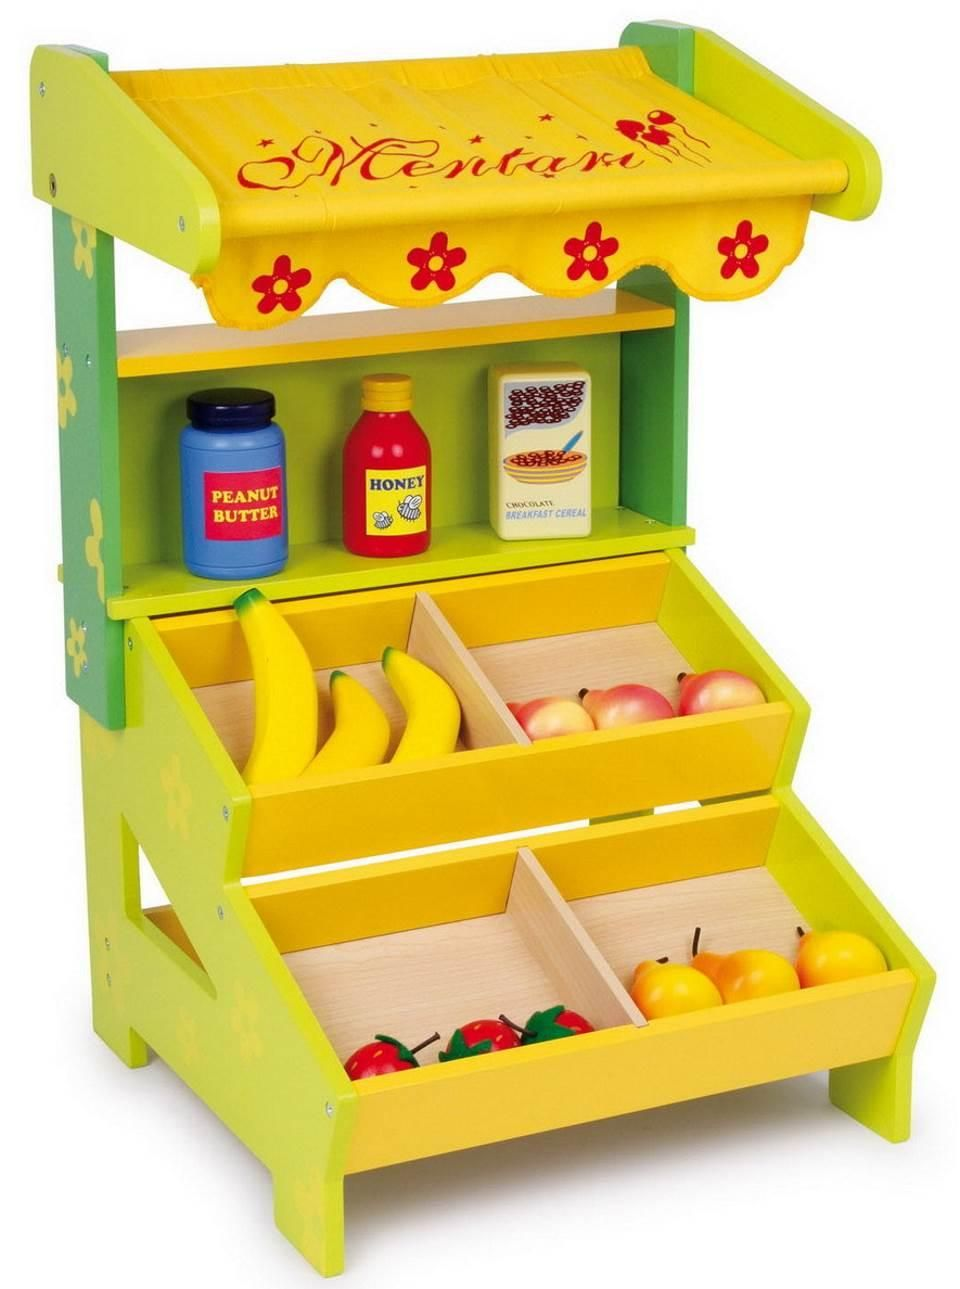 Muebles Didacticos Para Ninos - Tienda Infantil Minimarket Juguetes Kids Pinterest Tiendas [mjhdah]https://http2.mlstatic.com/mesita-de-actividades-juego-ninos-juguete-didactico-fn4-D_NQ_NP_3660-MLM4486312591_062013-F.jpg